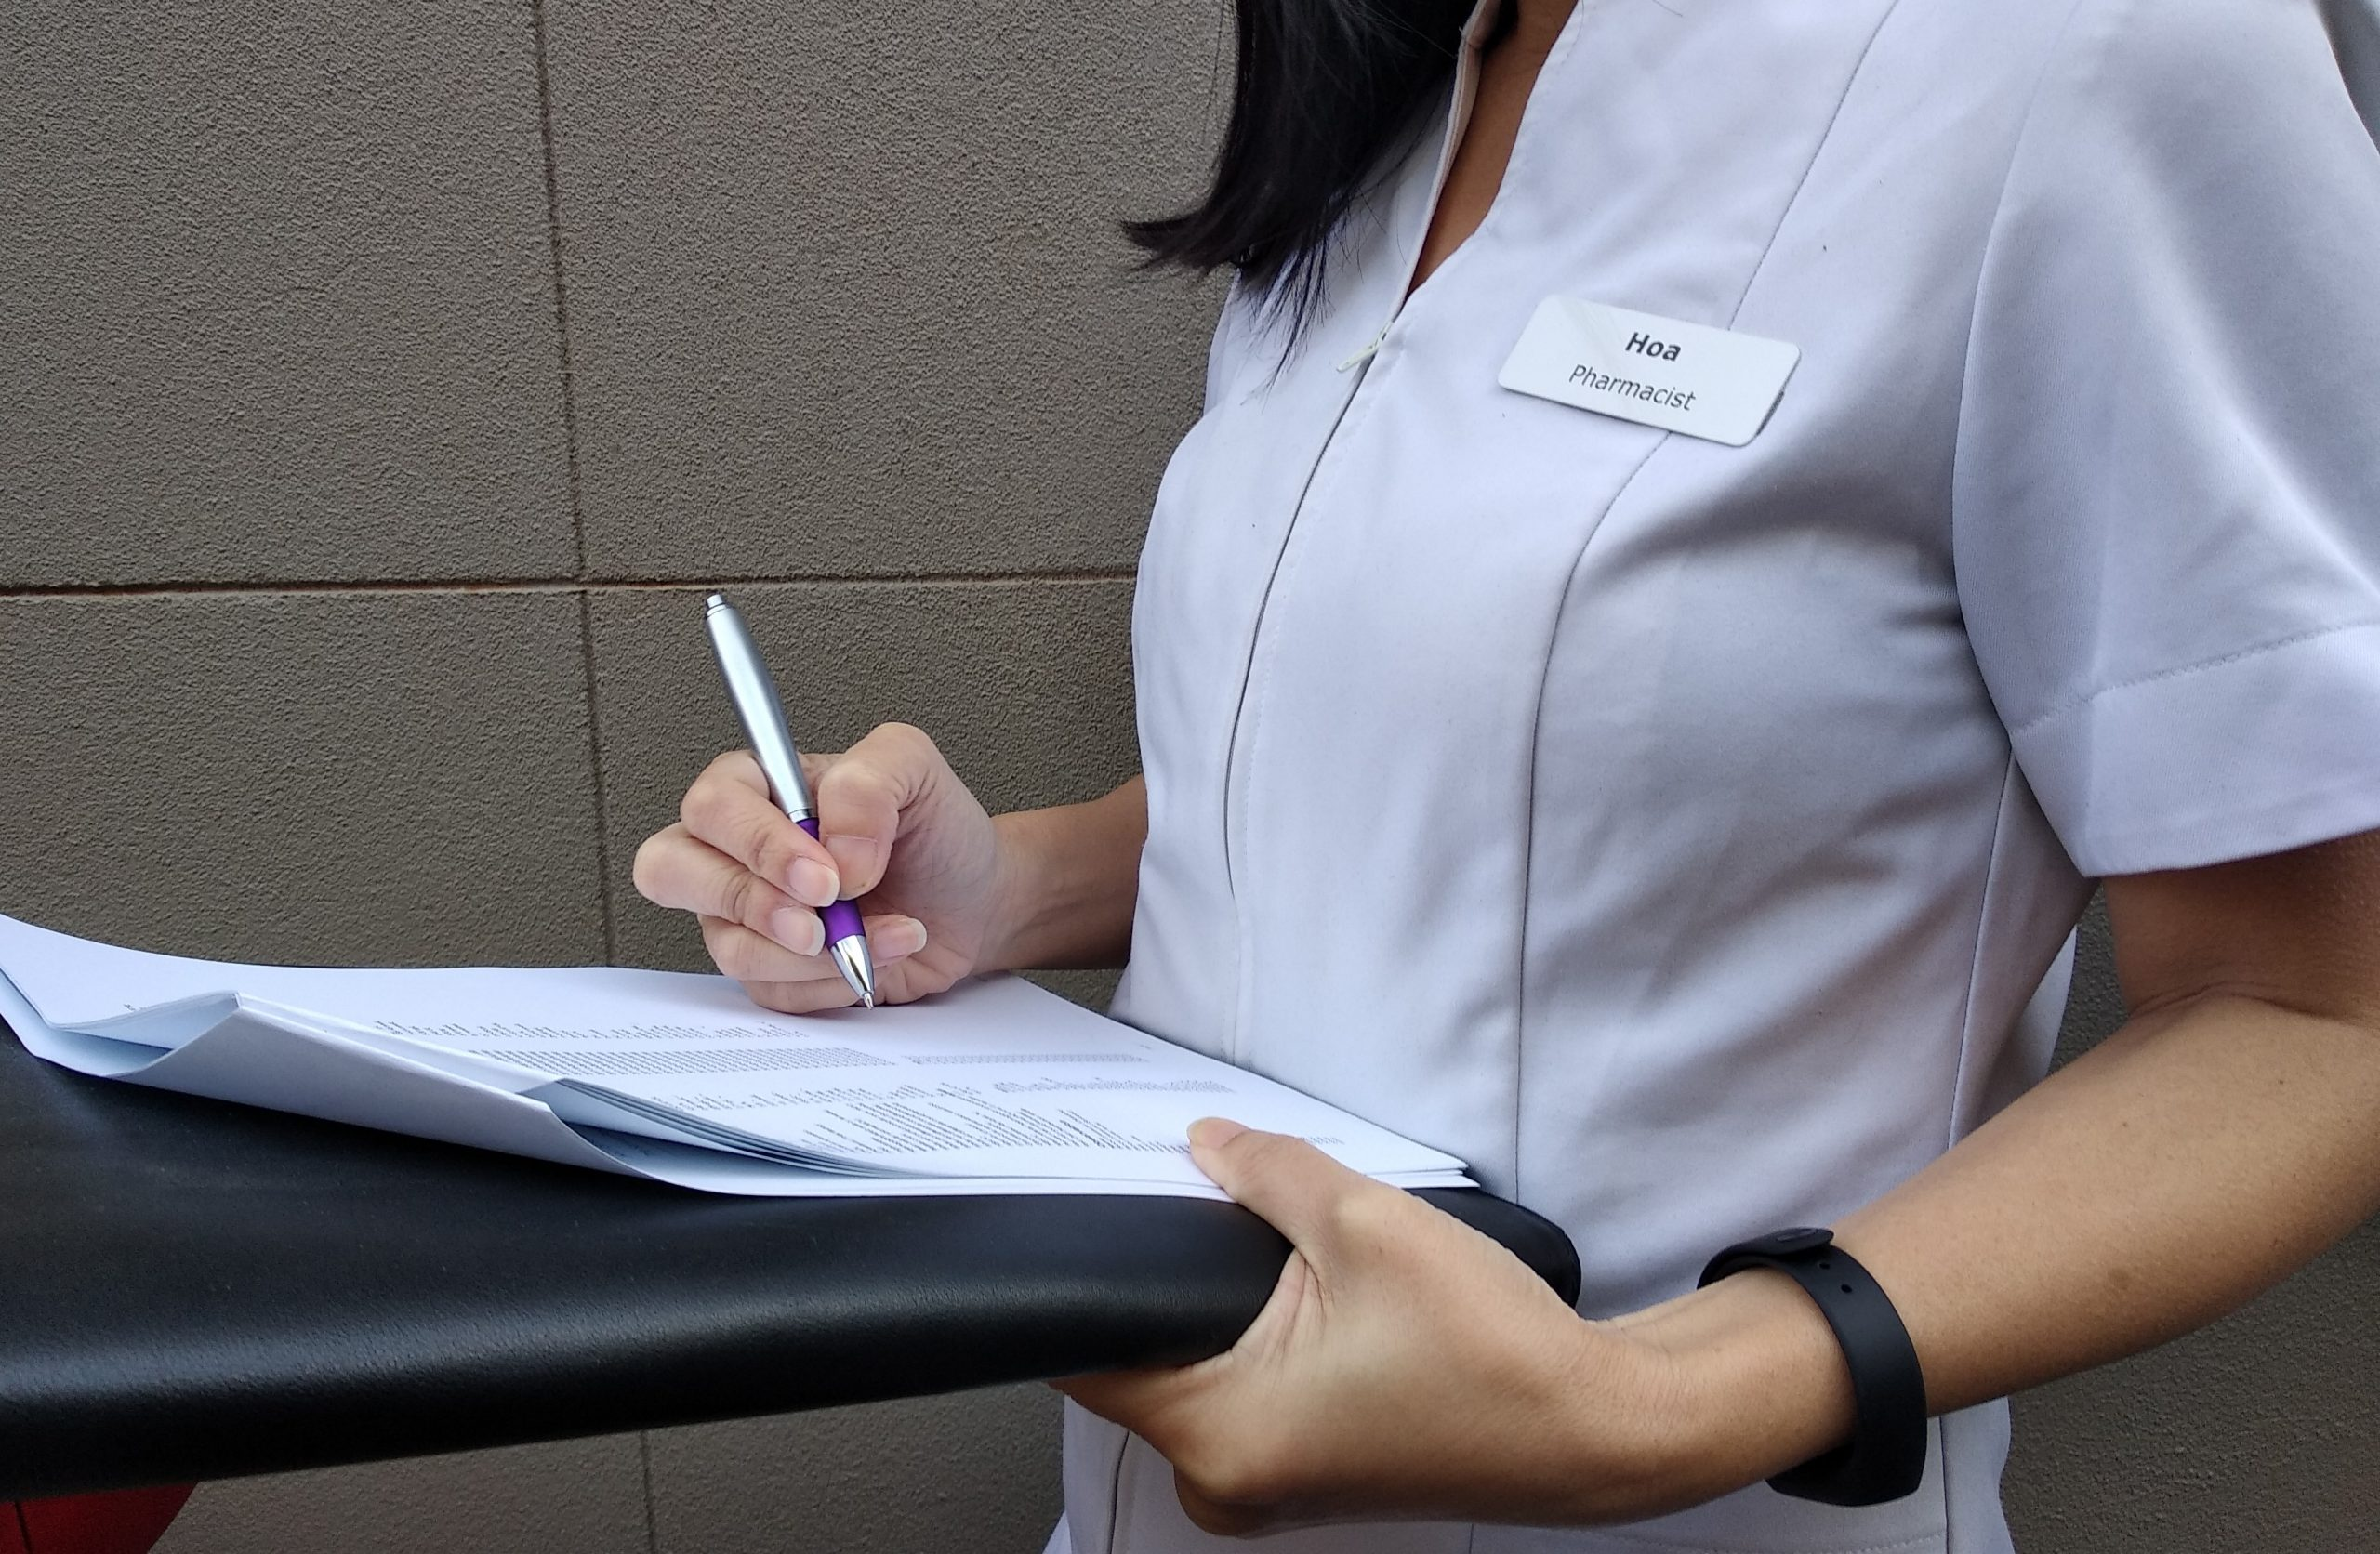 Pharmacist Writing on paper